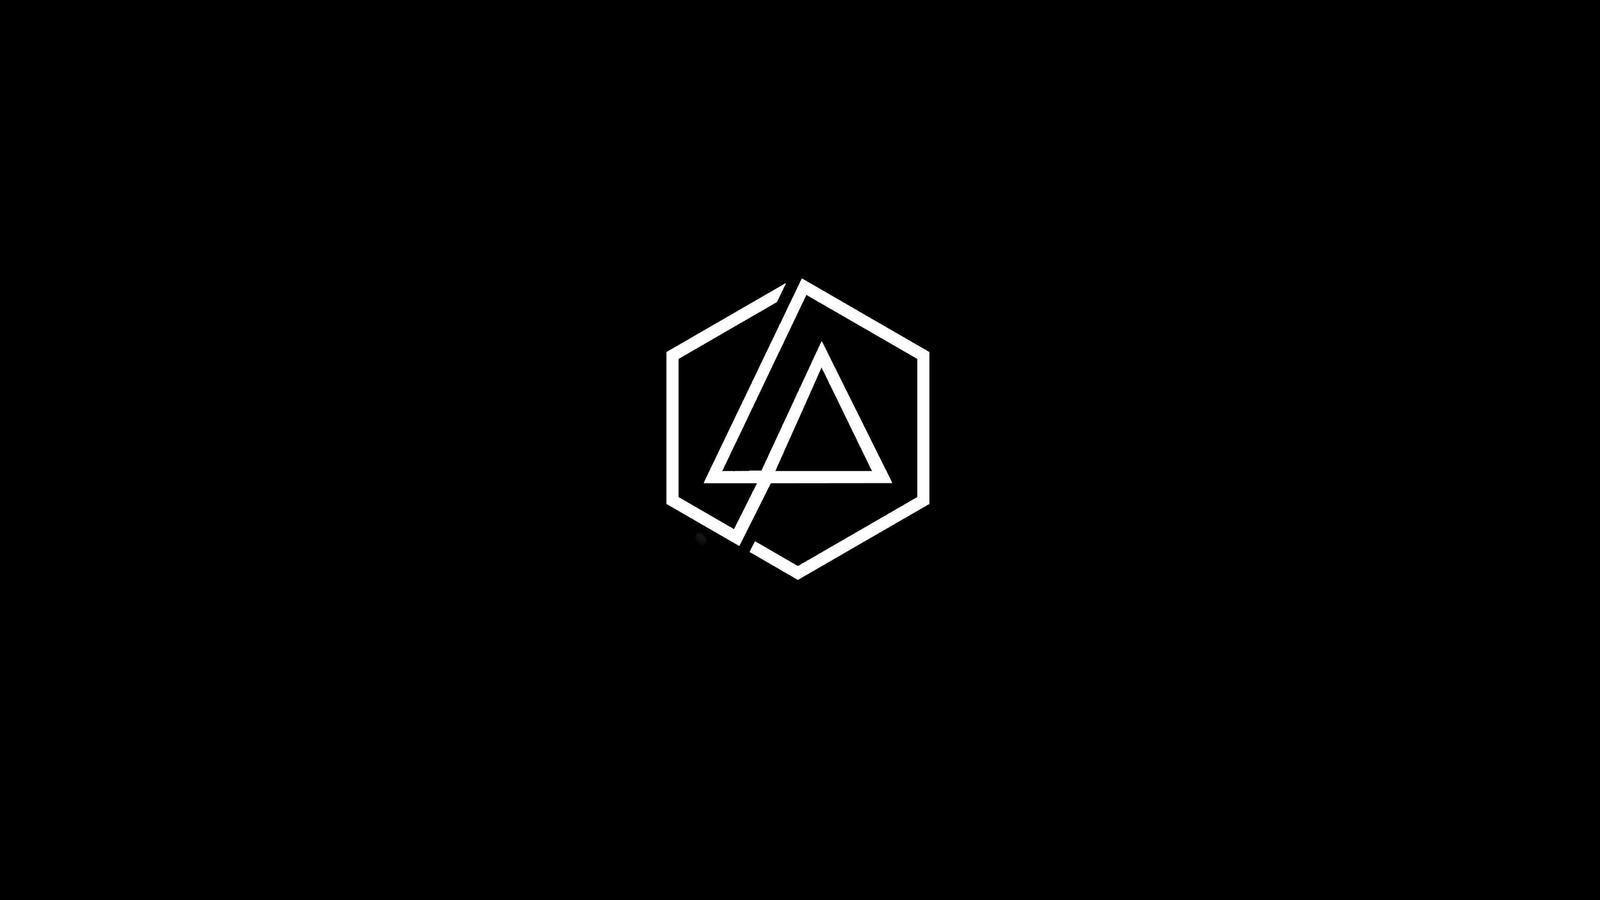 1600x900 Linkin Park Logo 4k 1600x900 Resolution Hd 4k Wallpapers